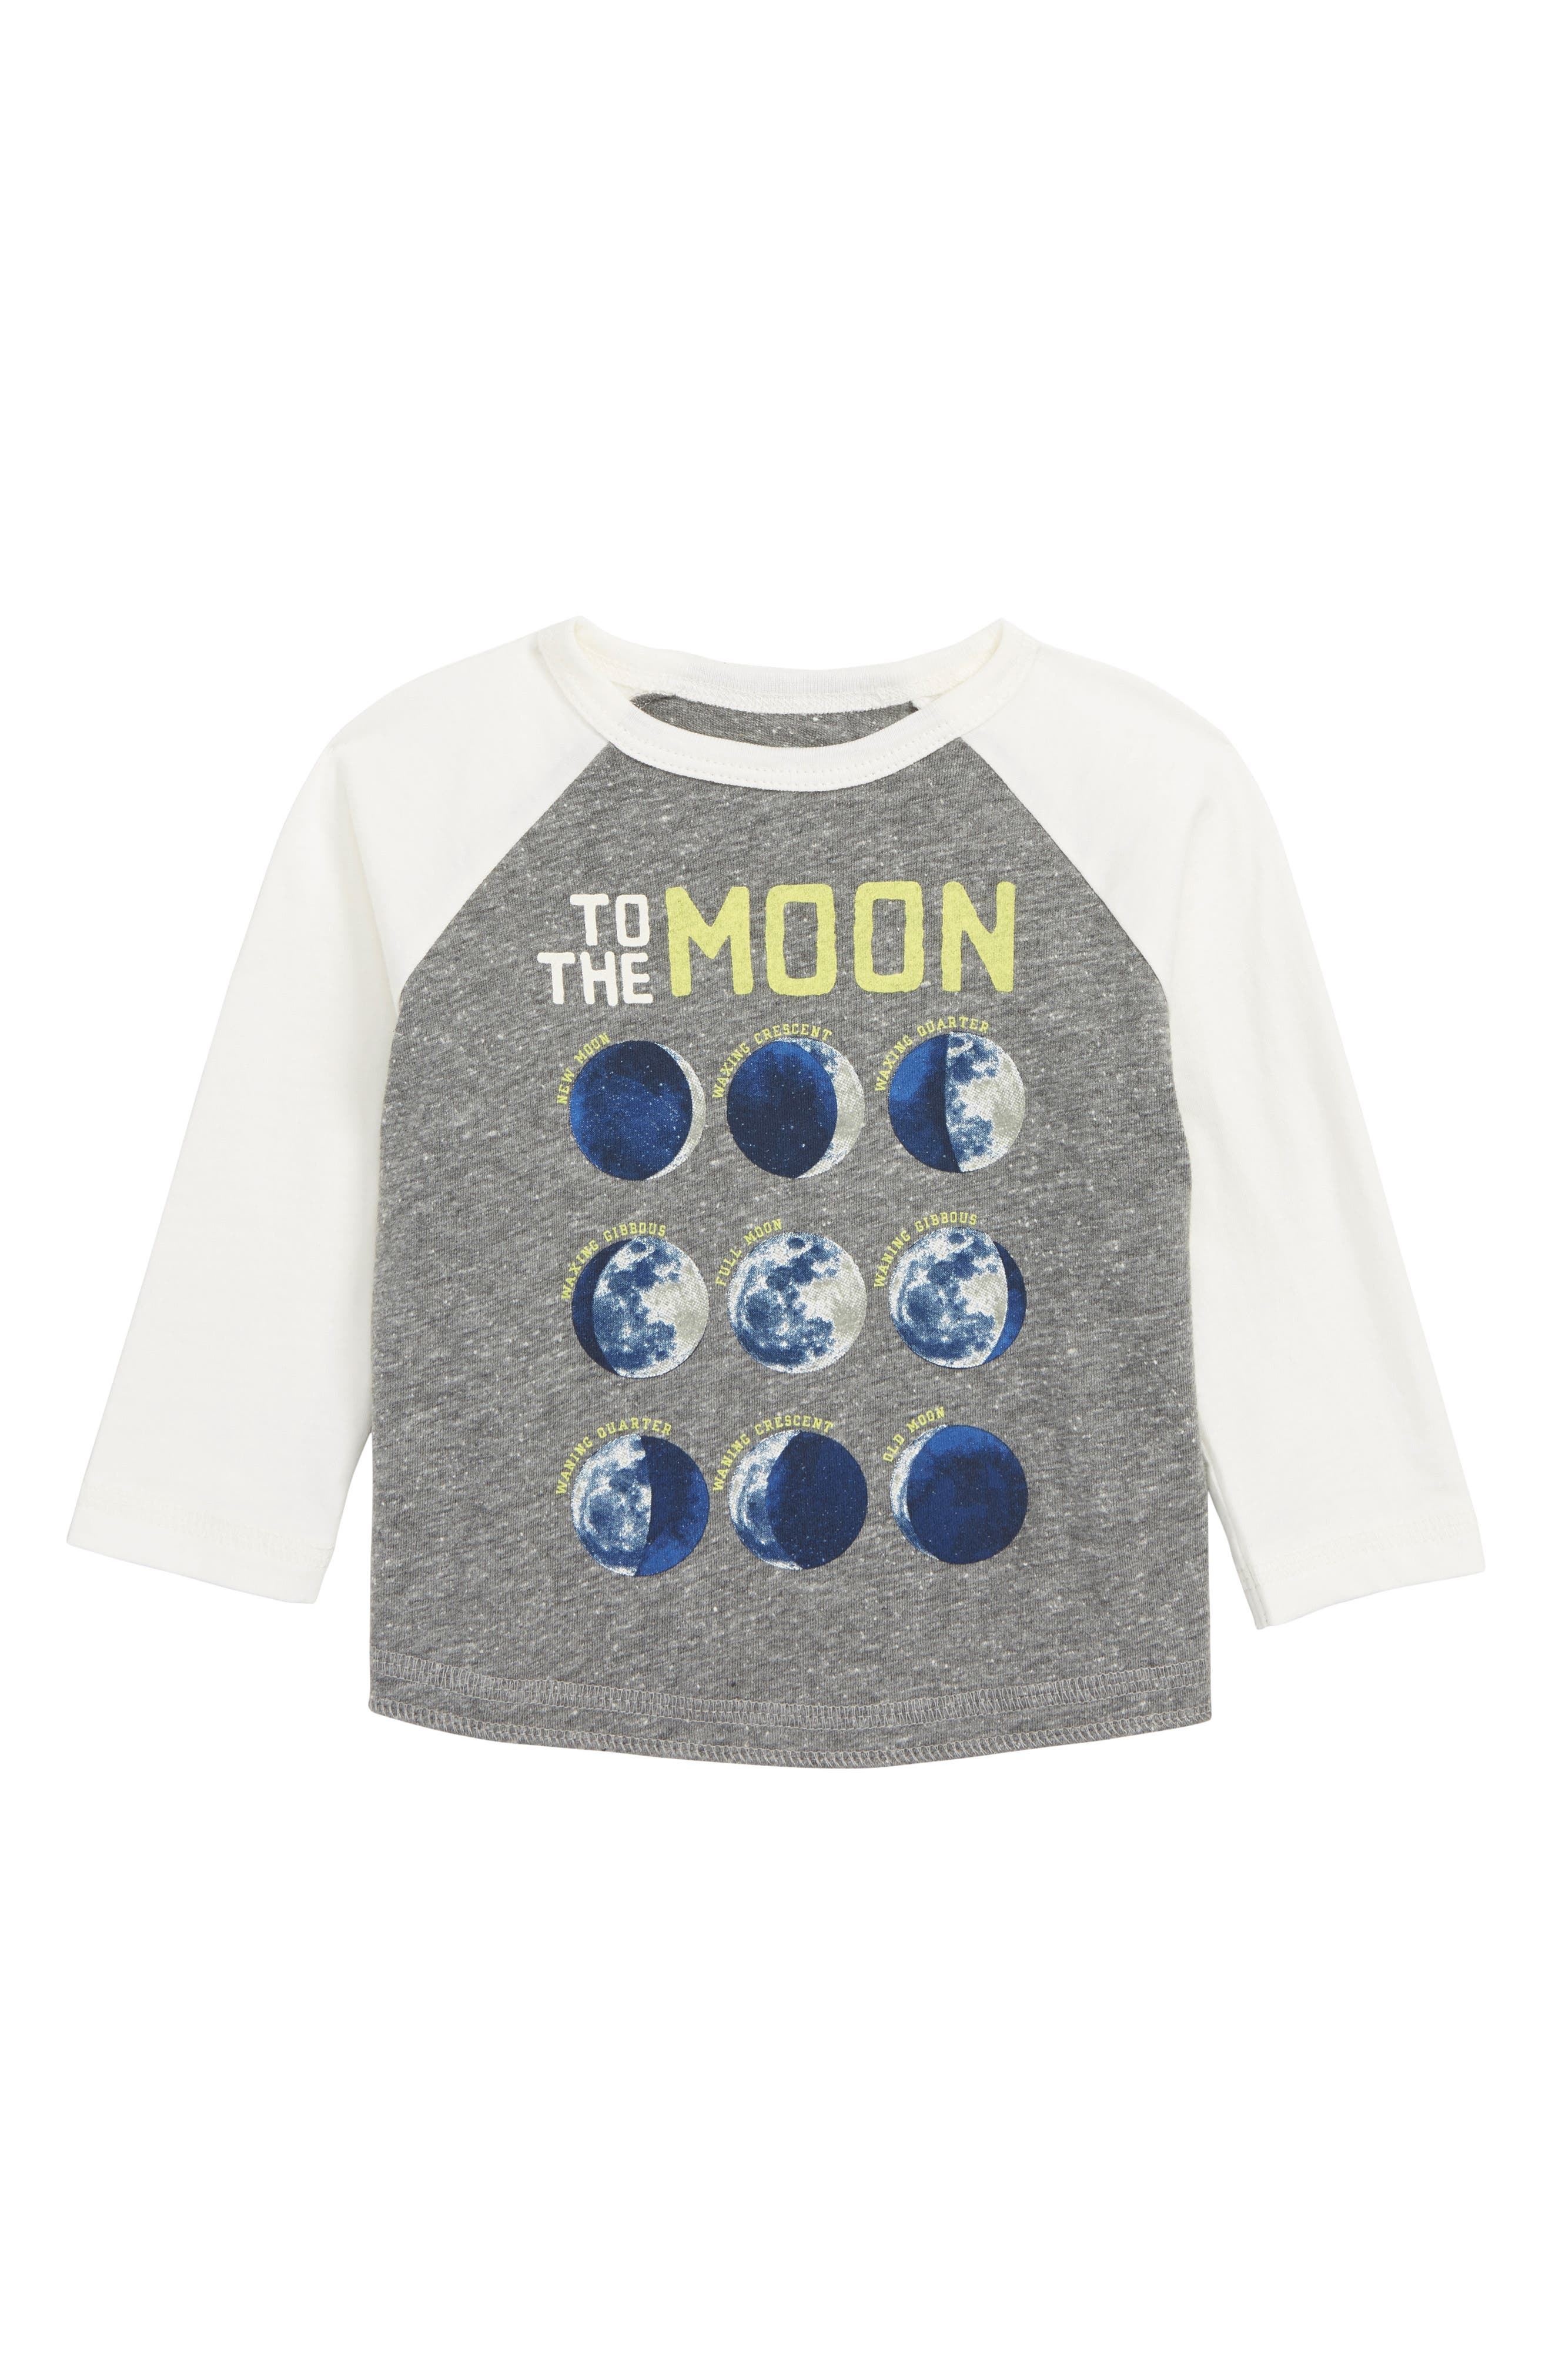 Moon and Back Glow in the Dark Raglan T-Shirt,                             Main thumbnail 1, color,                             HEATHER GREY